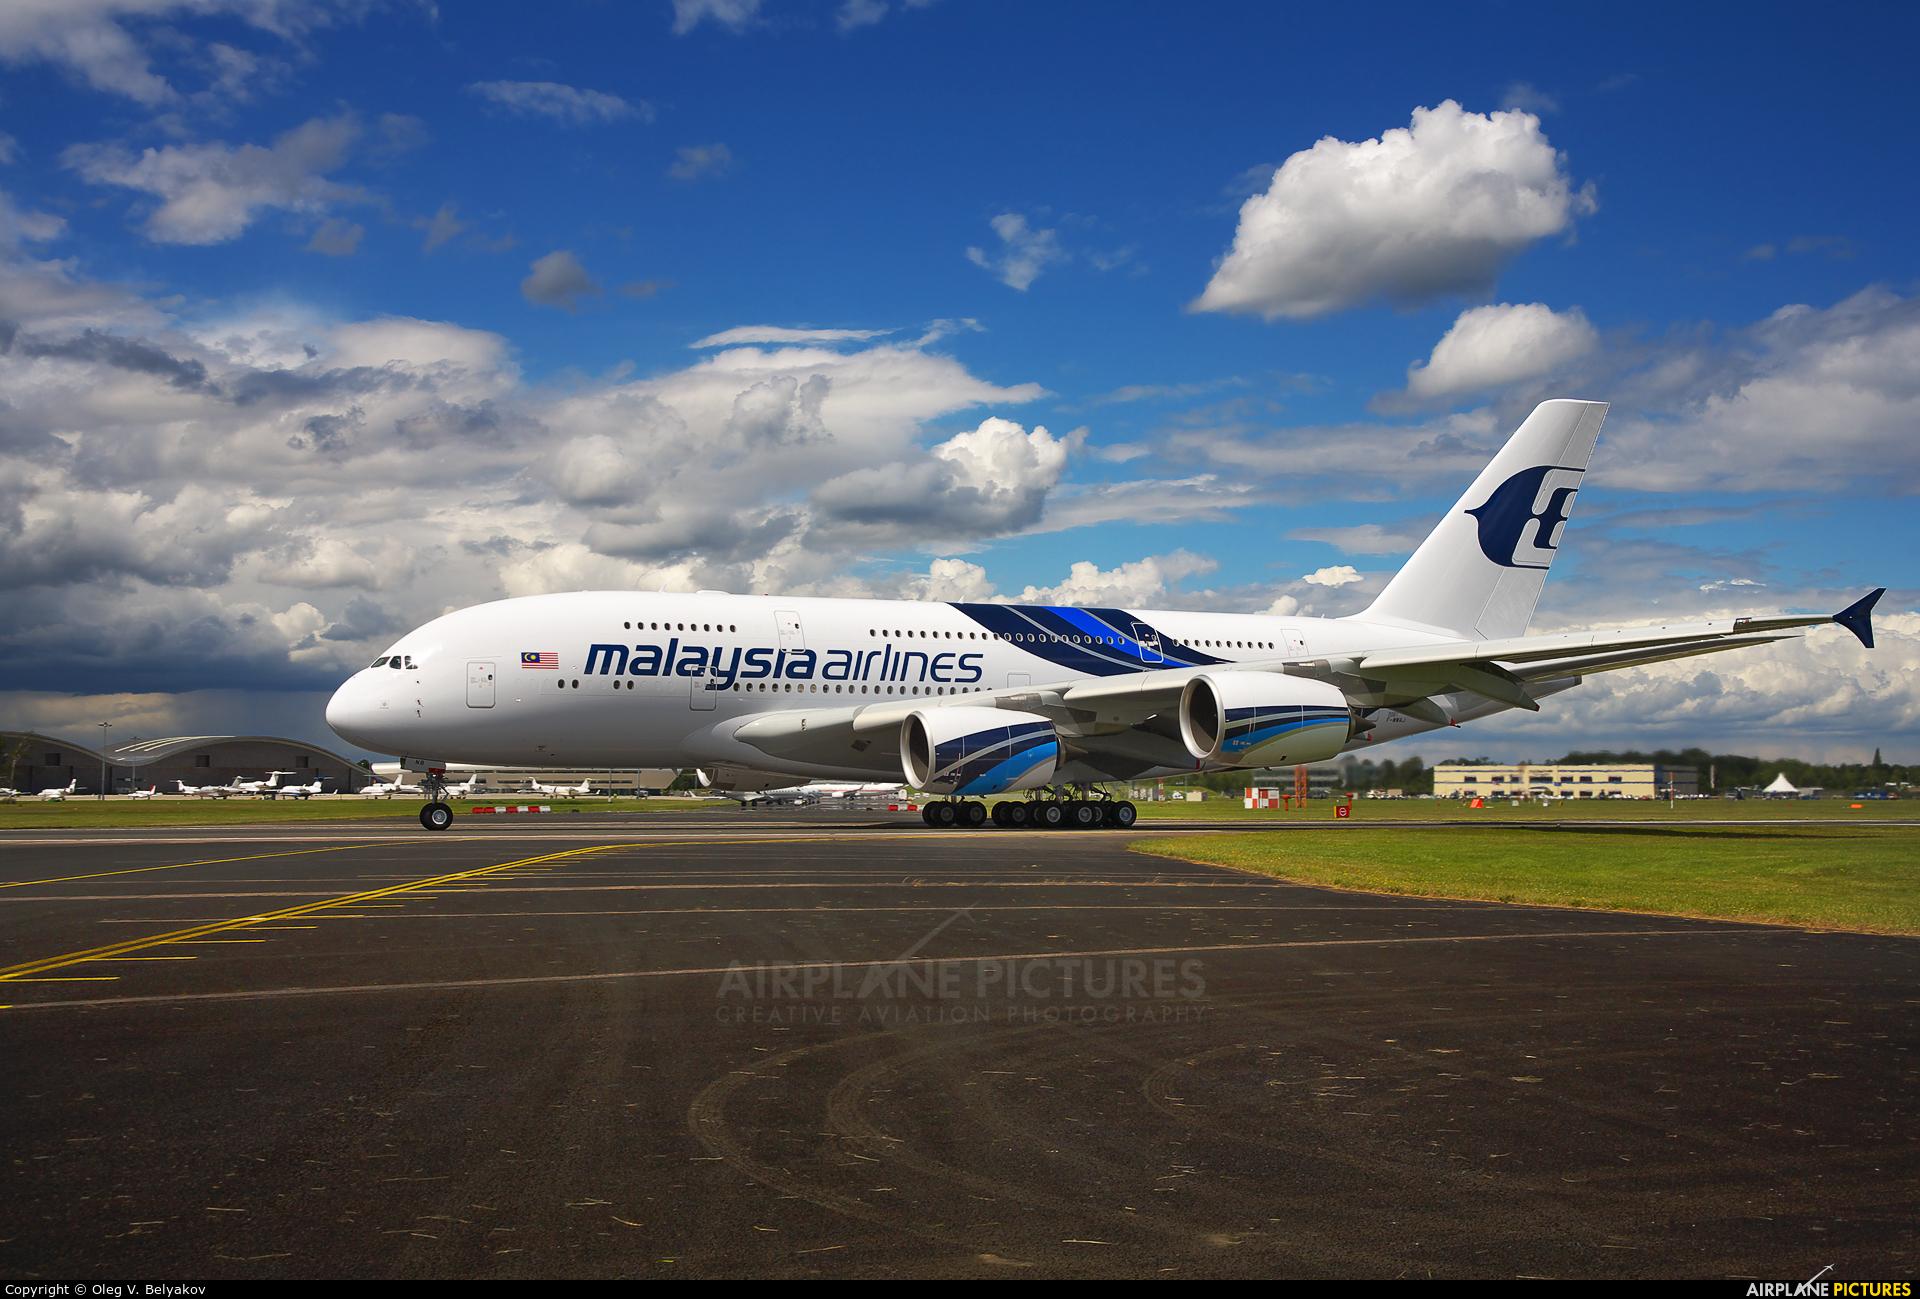 Malaysia Airlines F-WWAJ aircraft at Farnborough